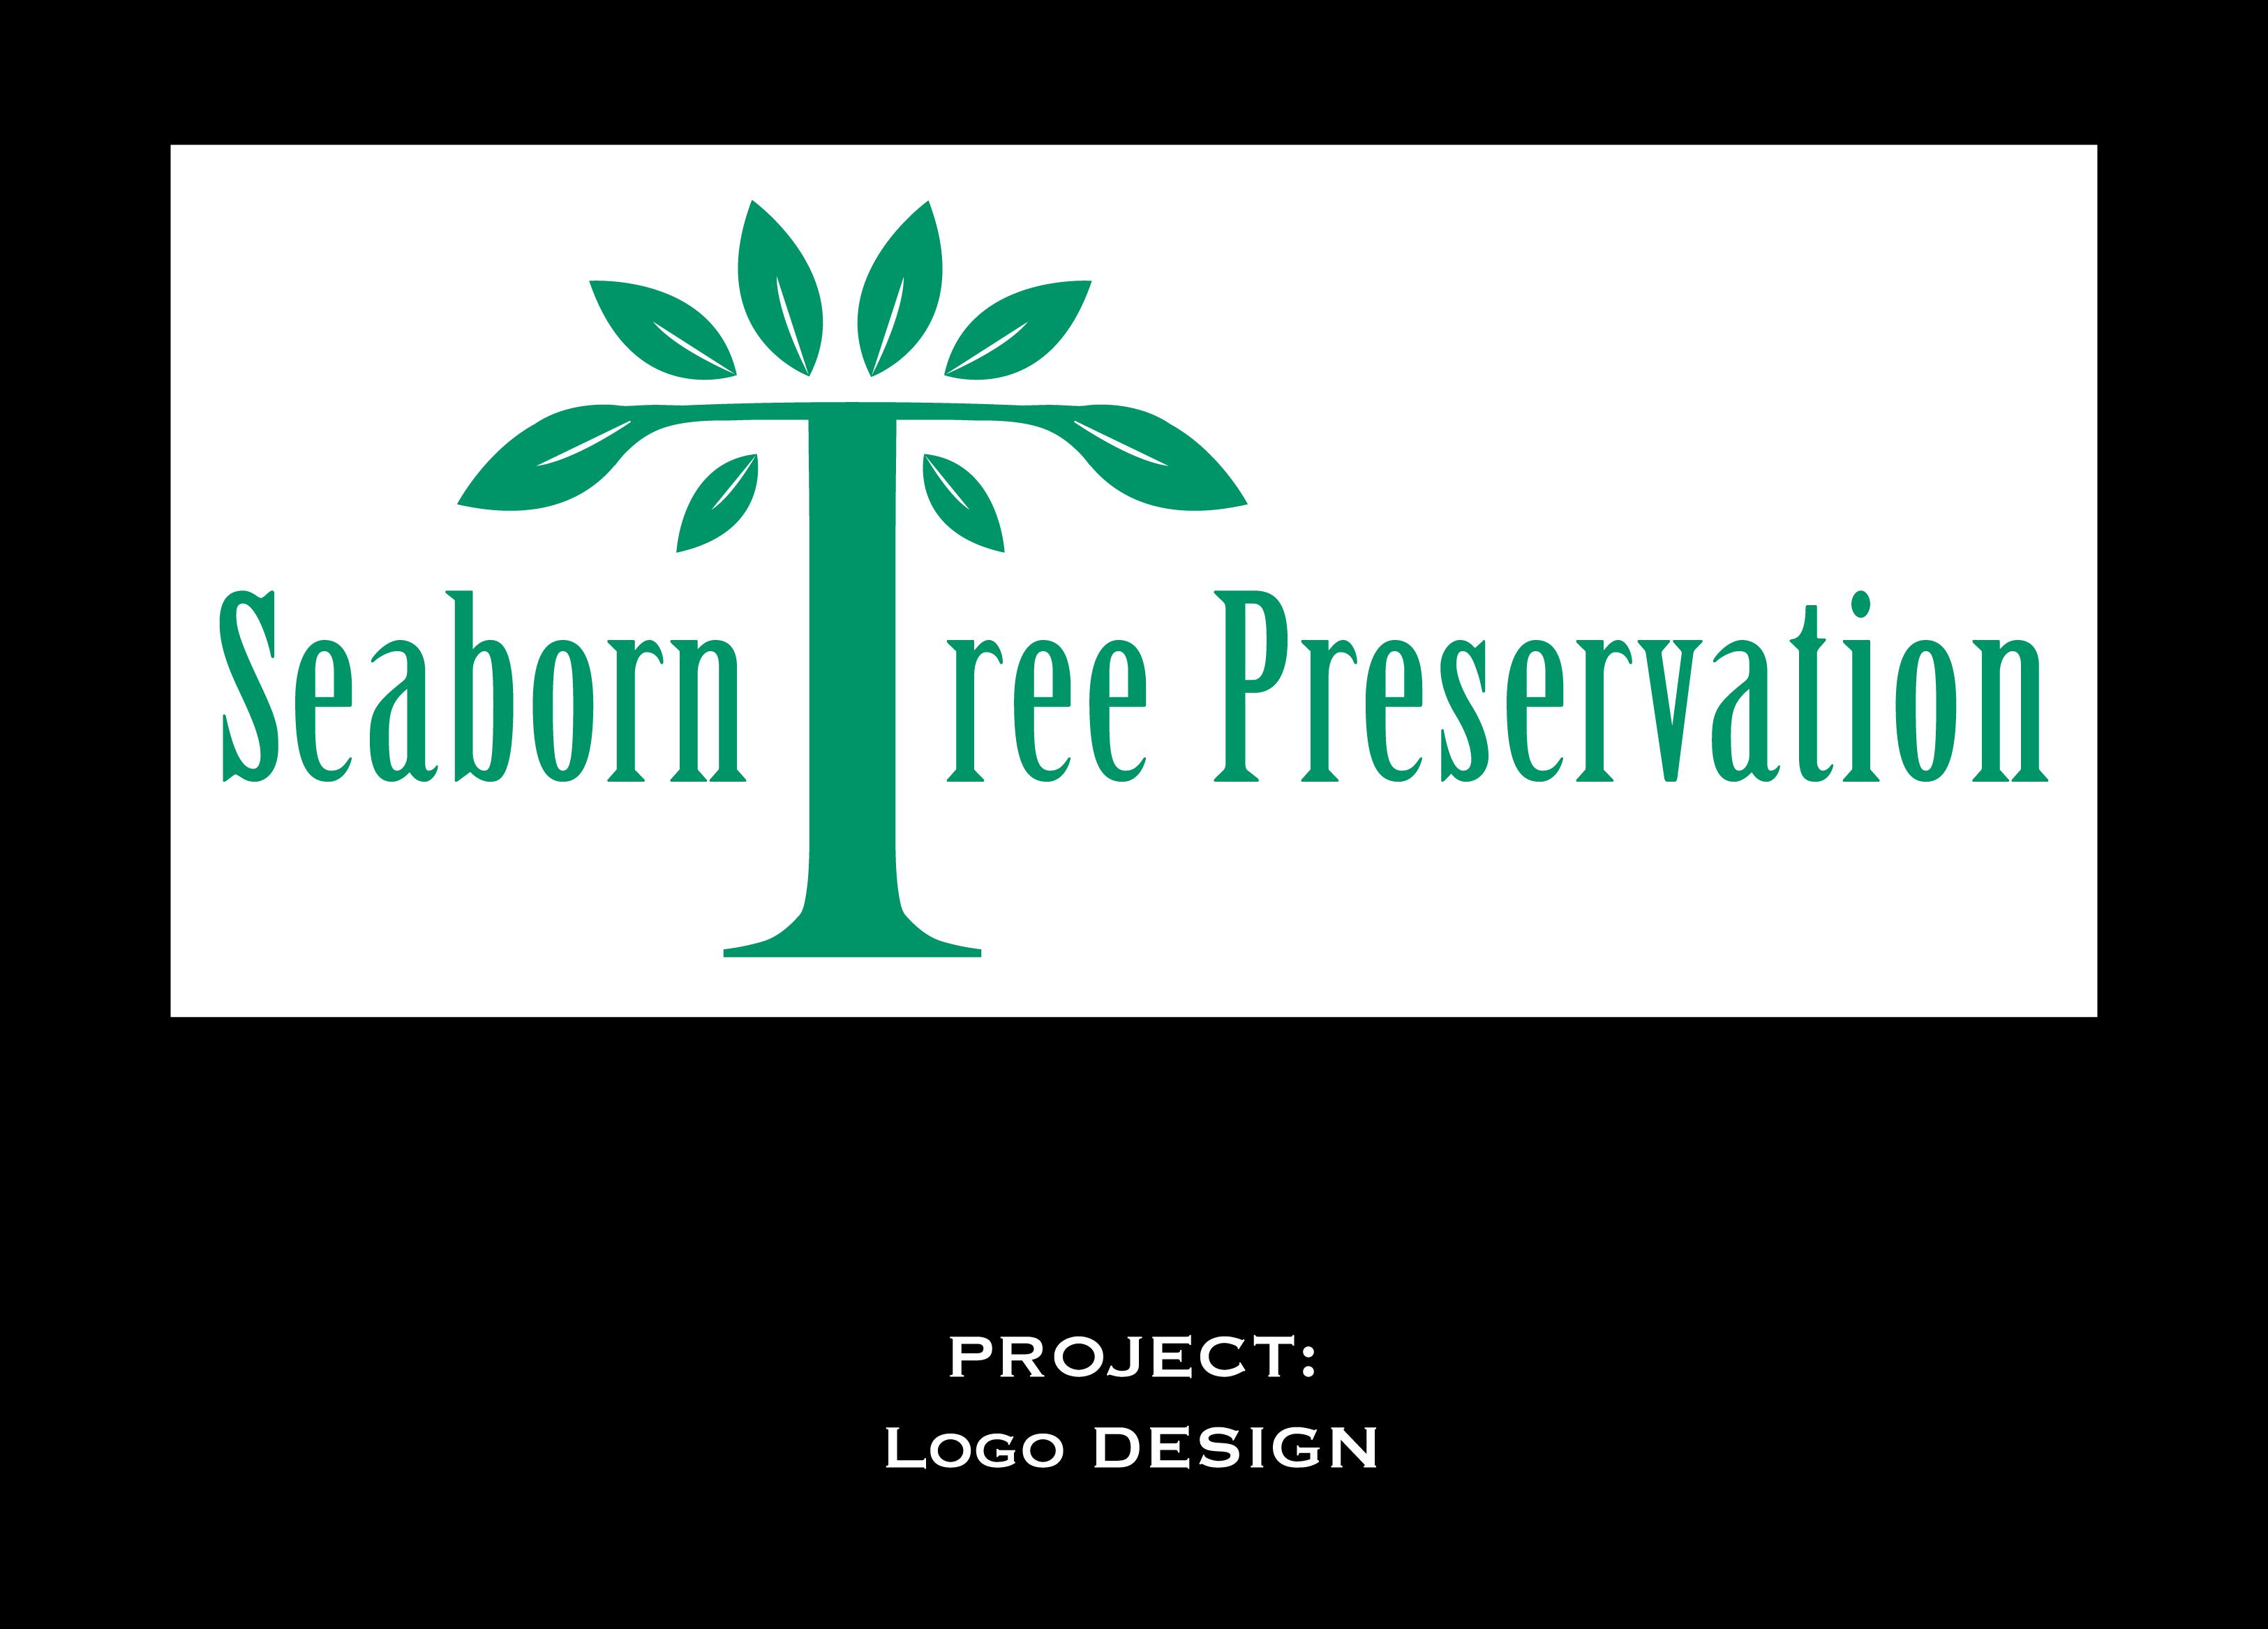 Seaborn logo design